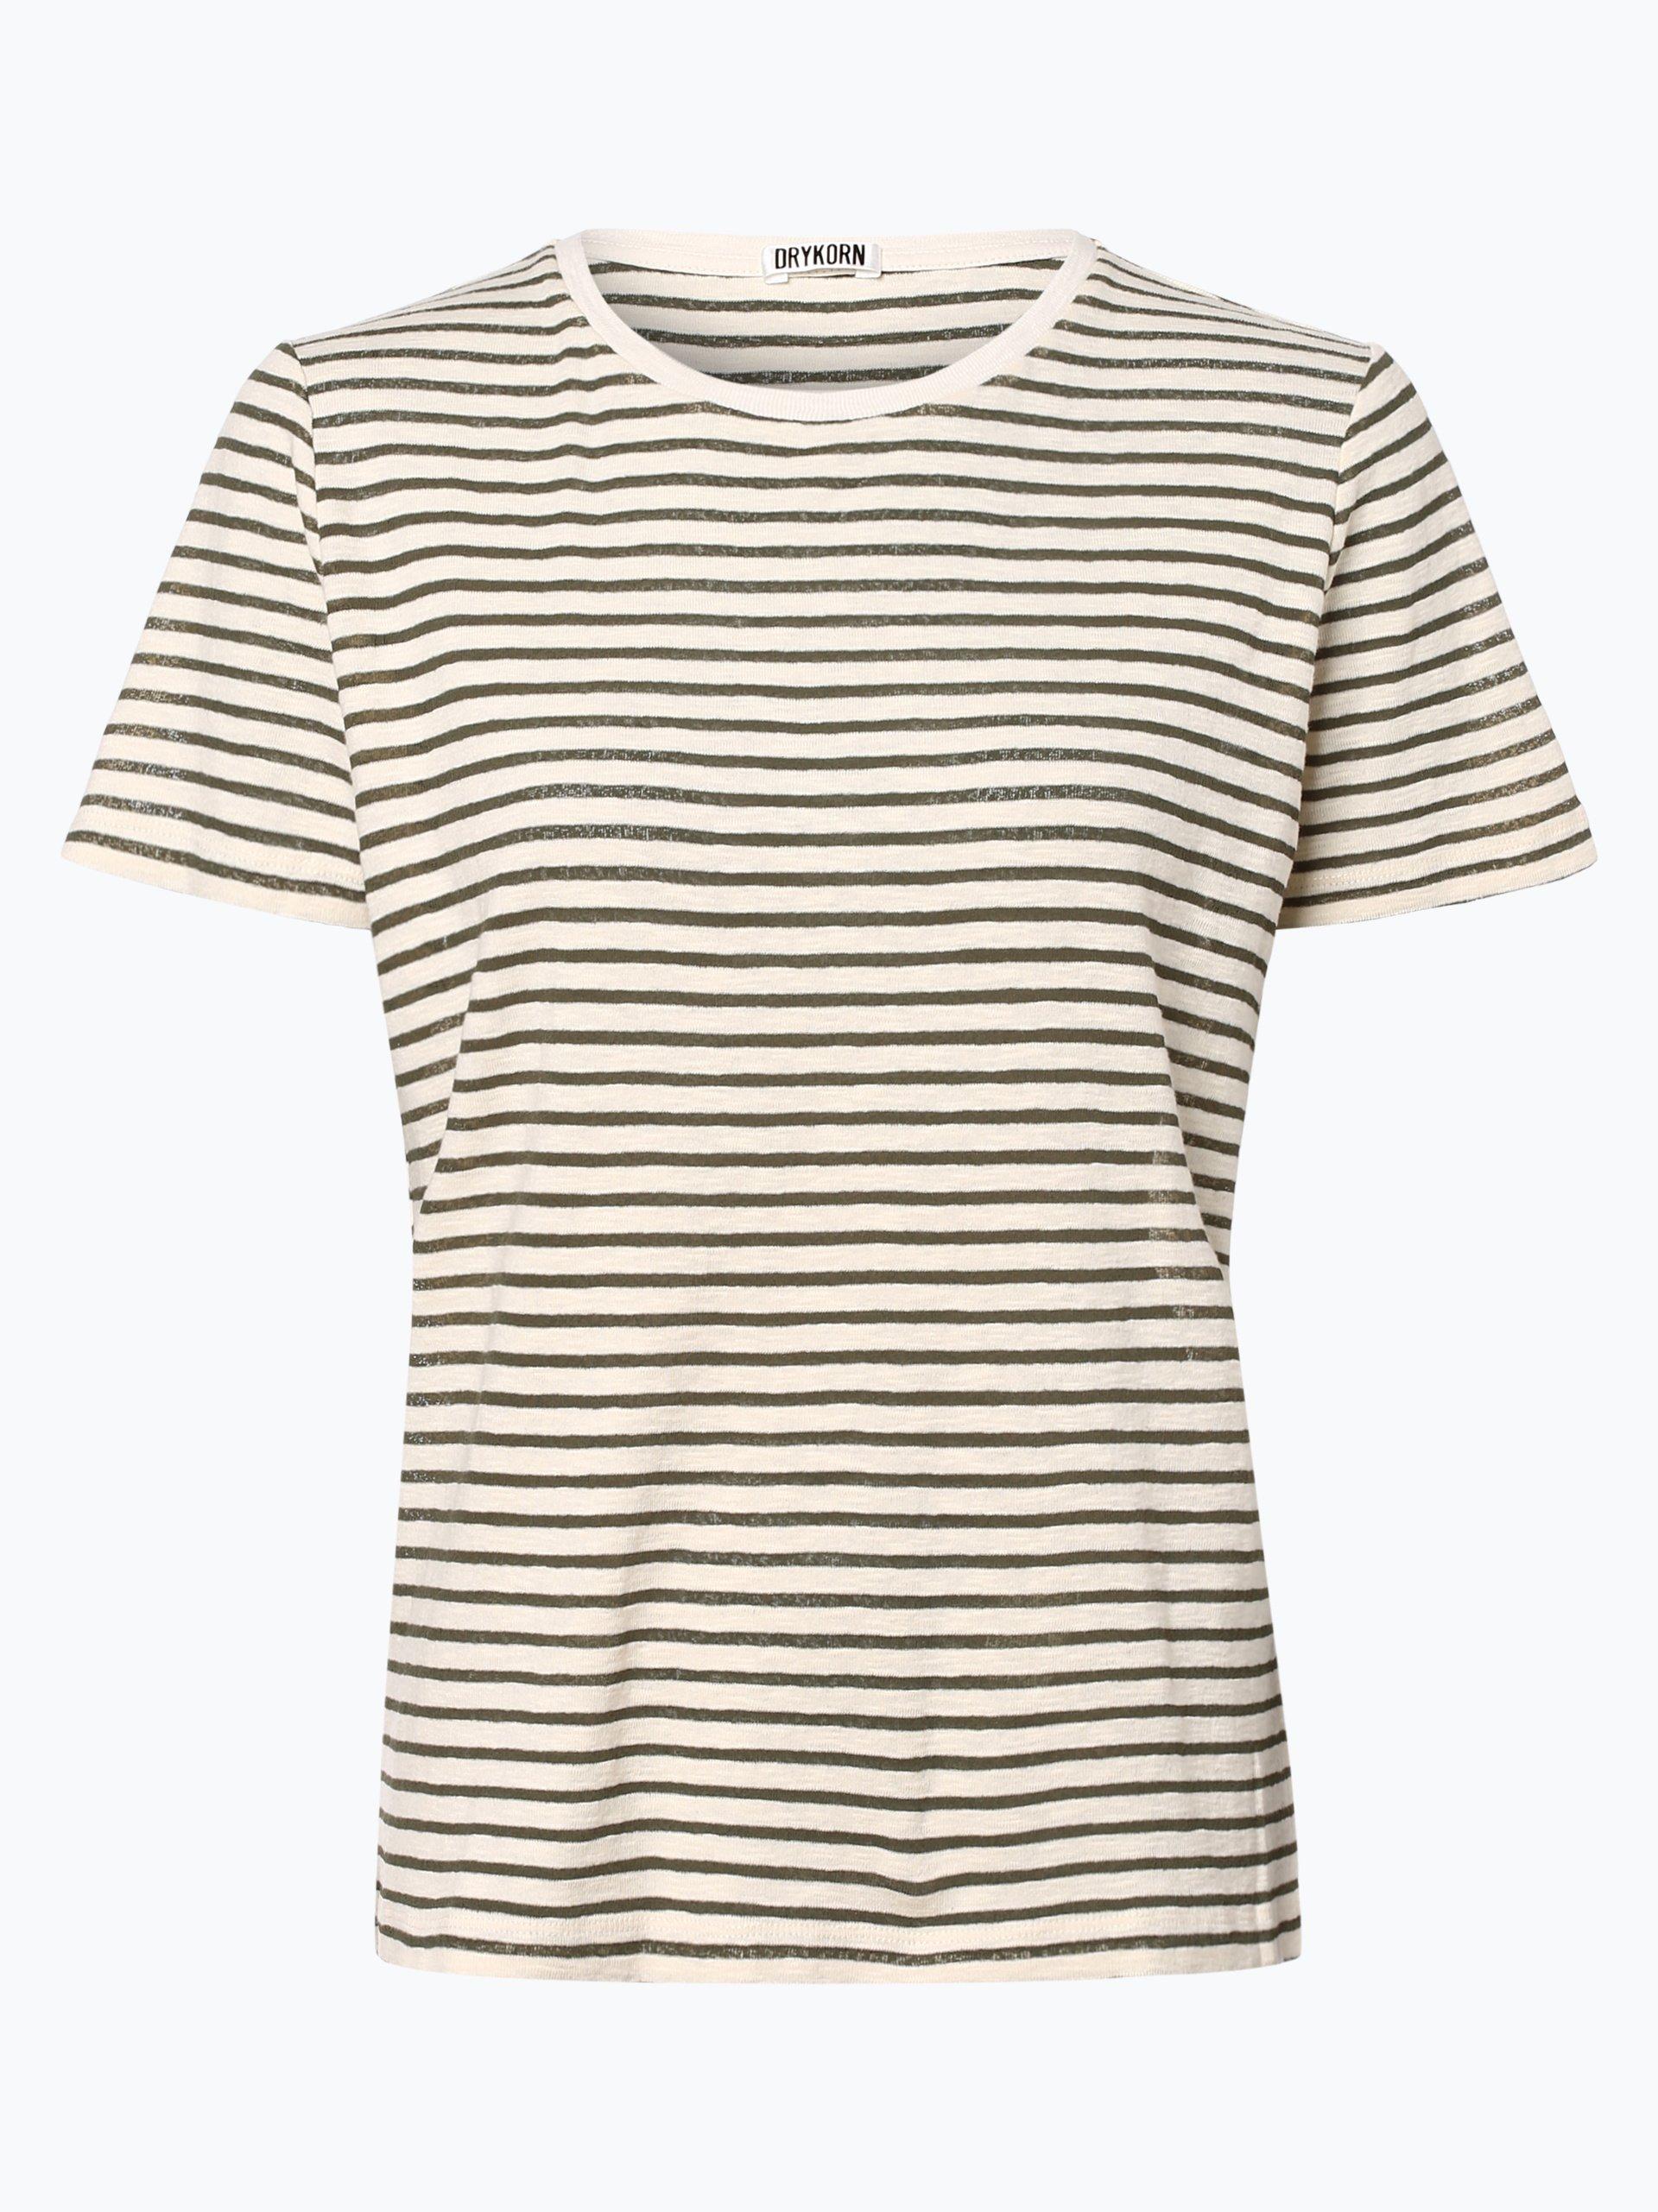 Drykorn Damen T-Shirt - Anisia